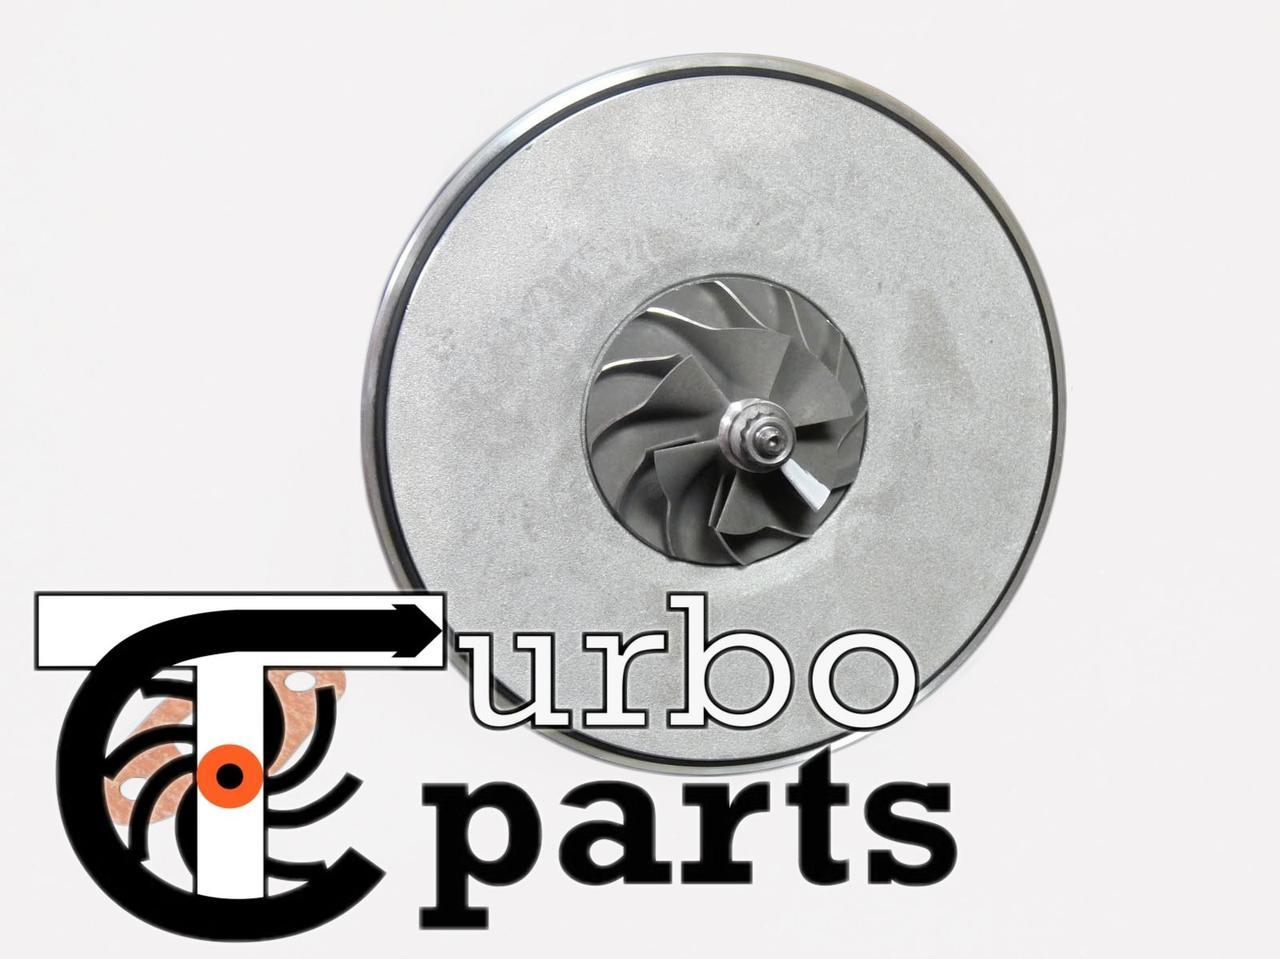 Картридж турбины Suzuki Grand Vitara 2.0HDI от 2002 г.в. - 734204-0001, 713667-0001, 713667-0003